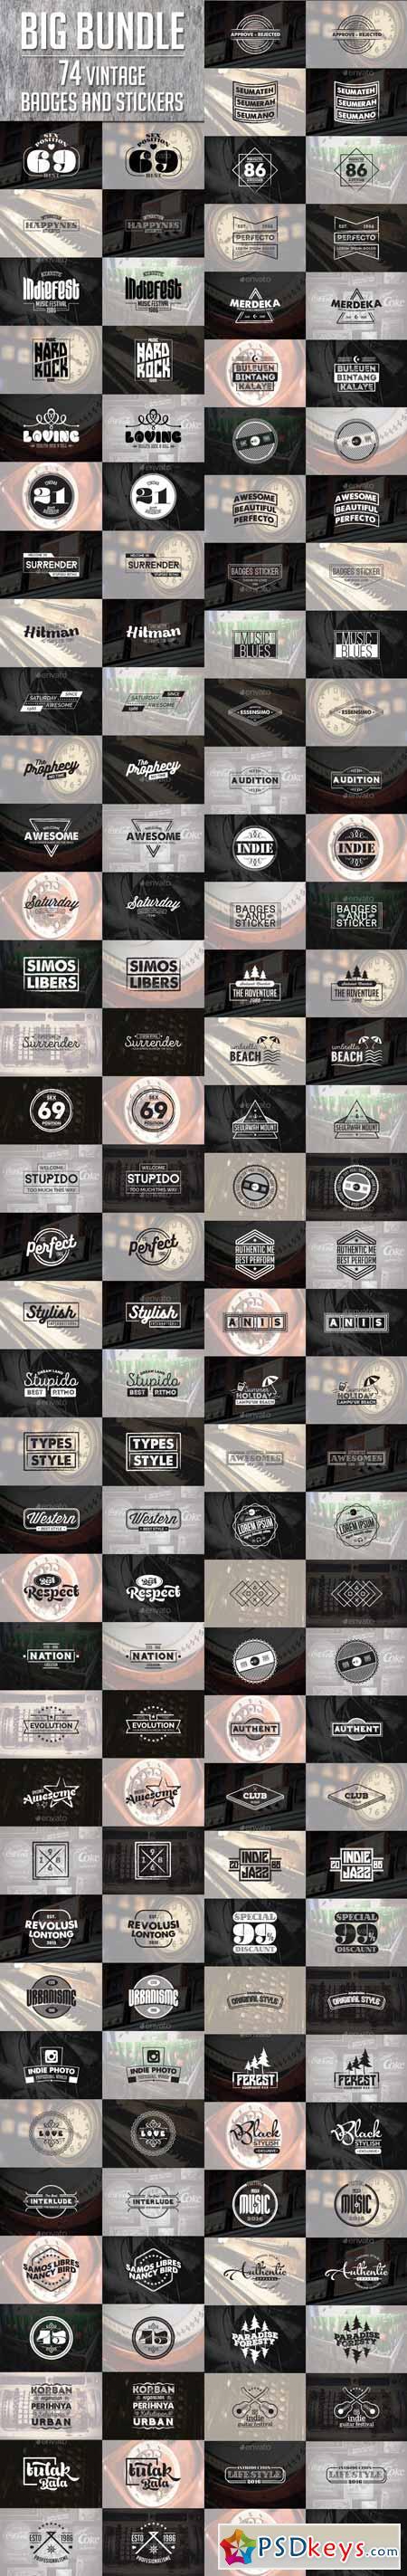 74 Vintage Badges and Stickers - Bundle Vol 2 13105438